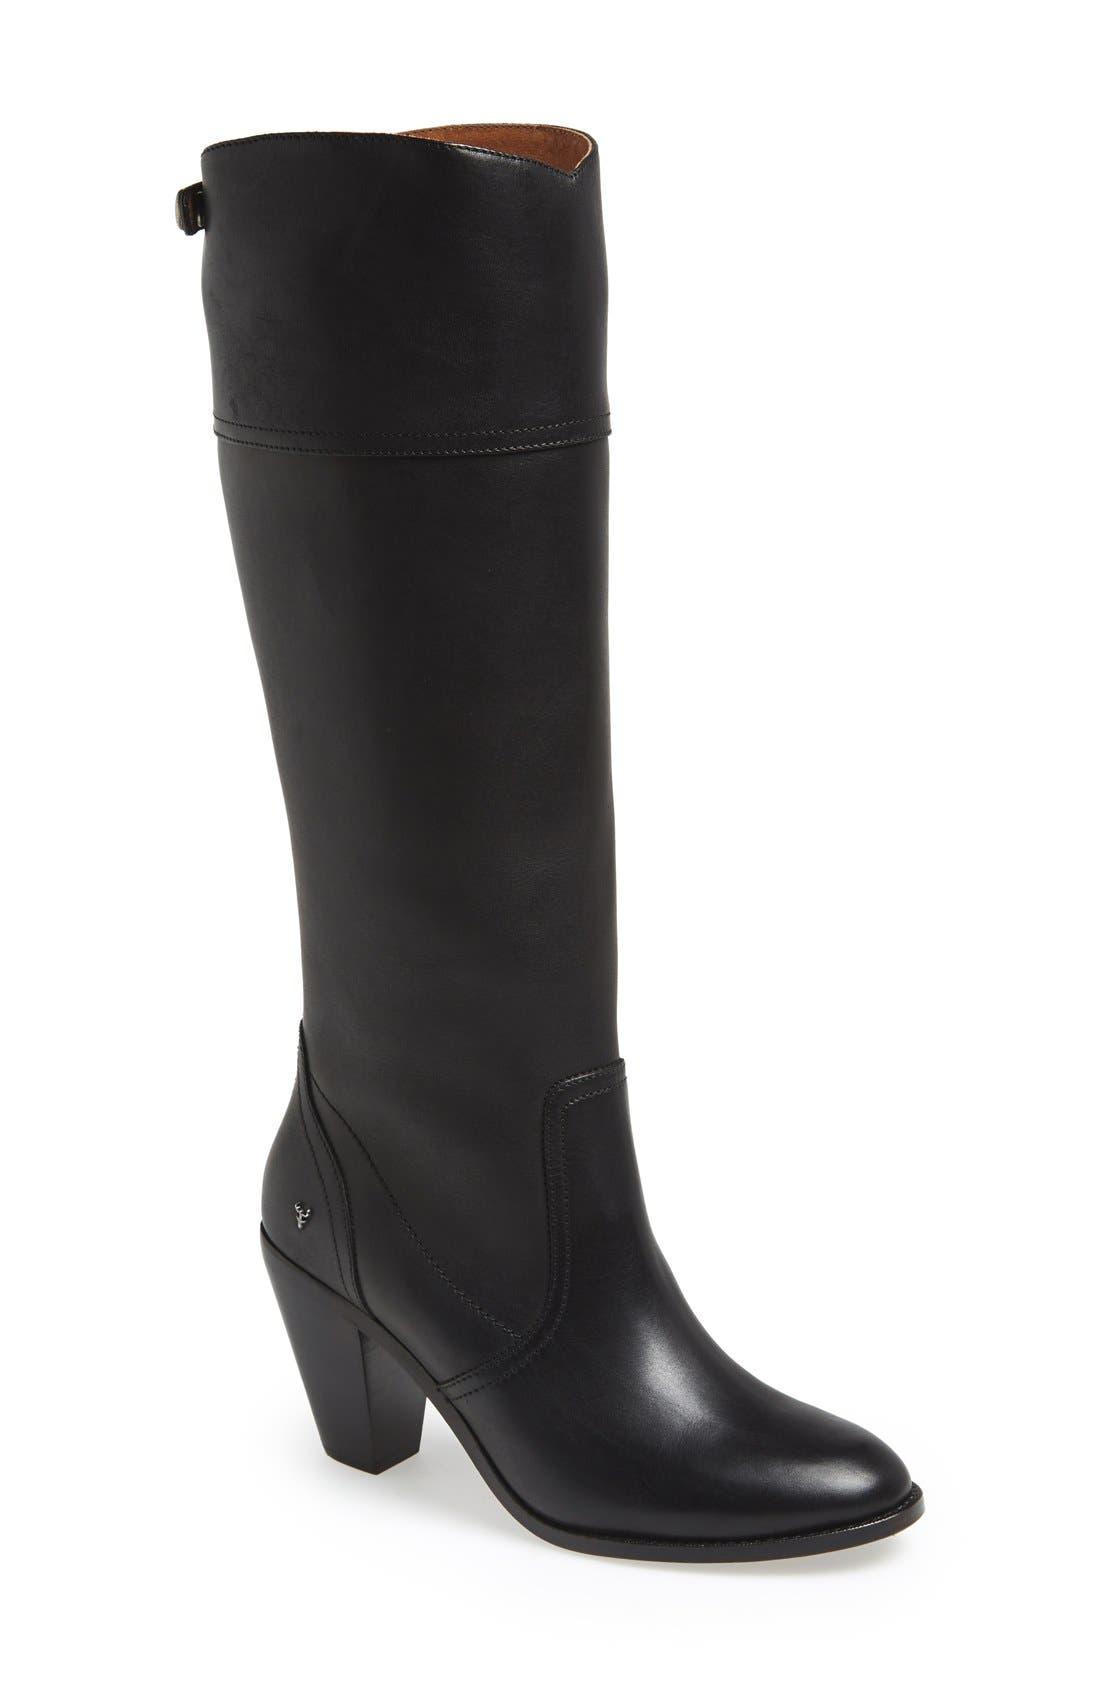 Main Image - Trask 'Abbey' Tall Boot (Women)